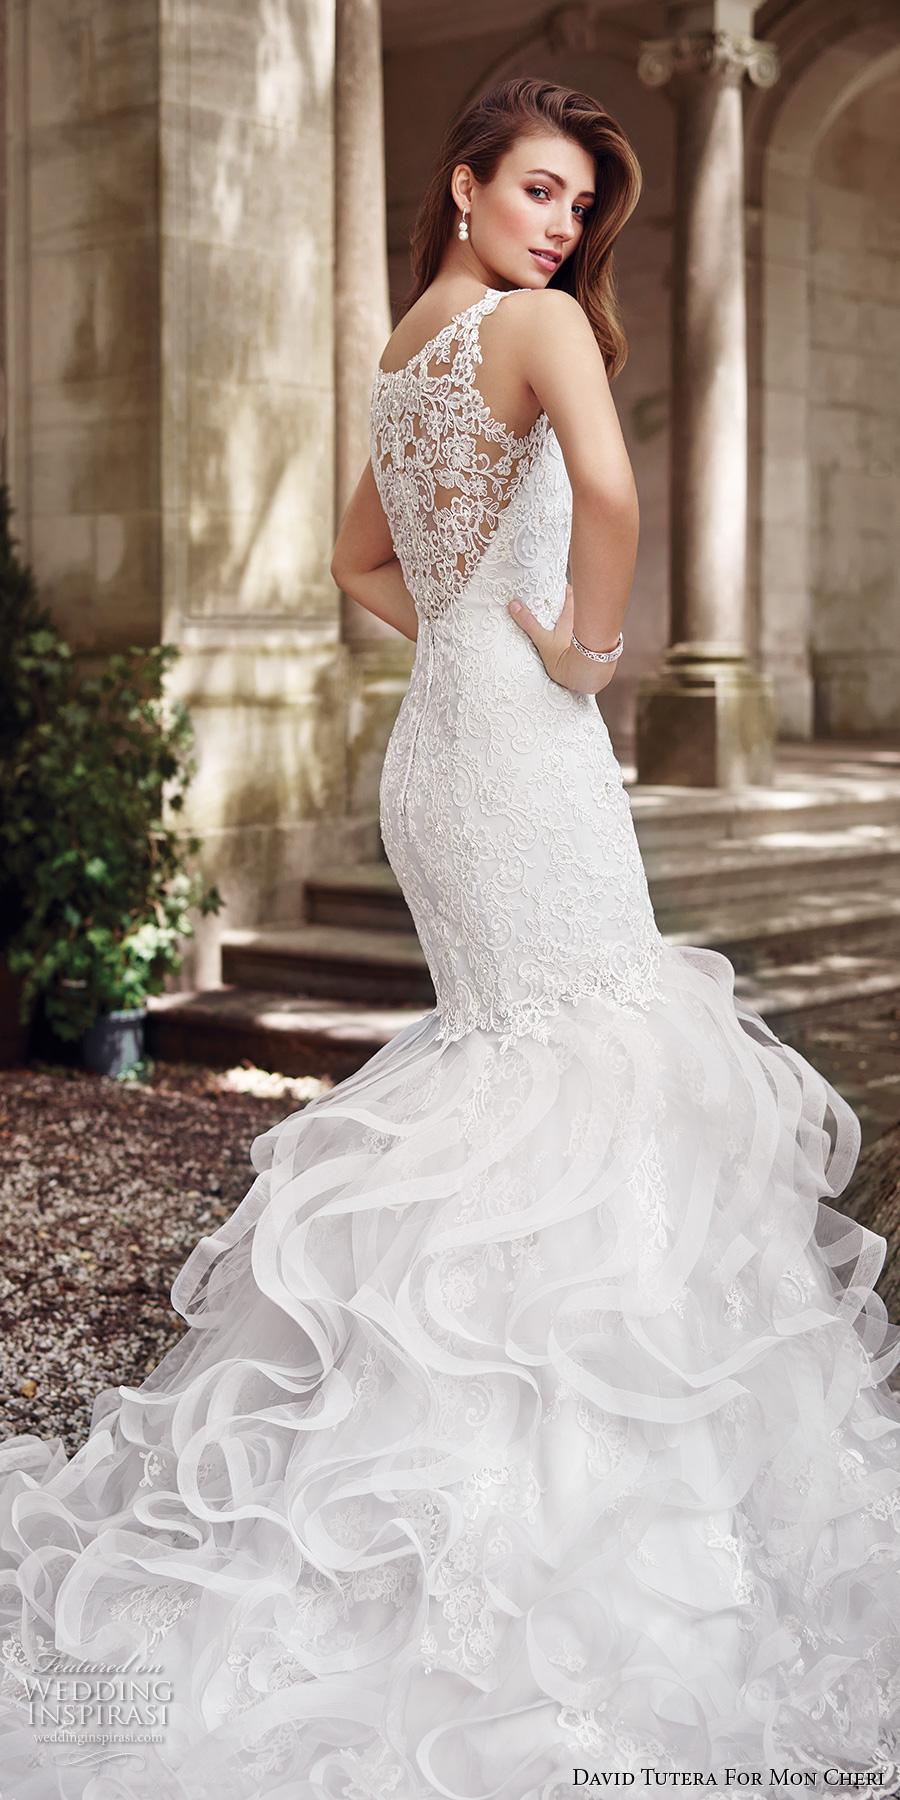 Mermaid Wedding Dresses David Tutera